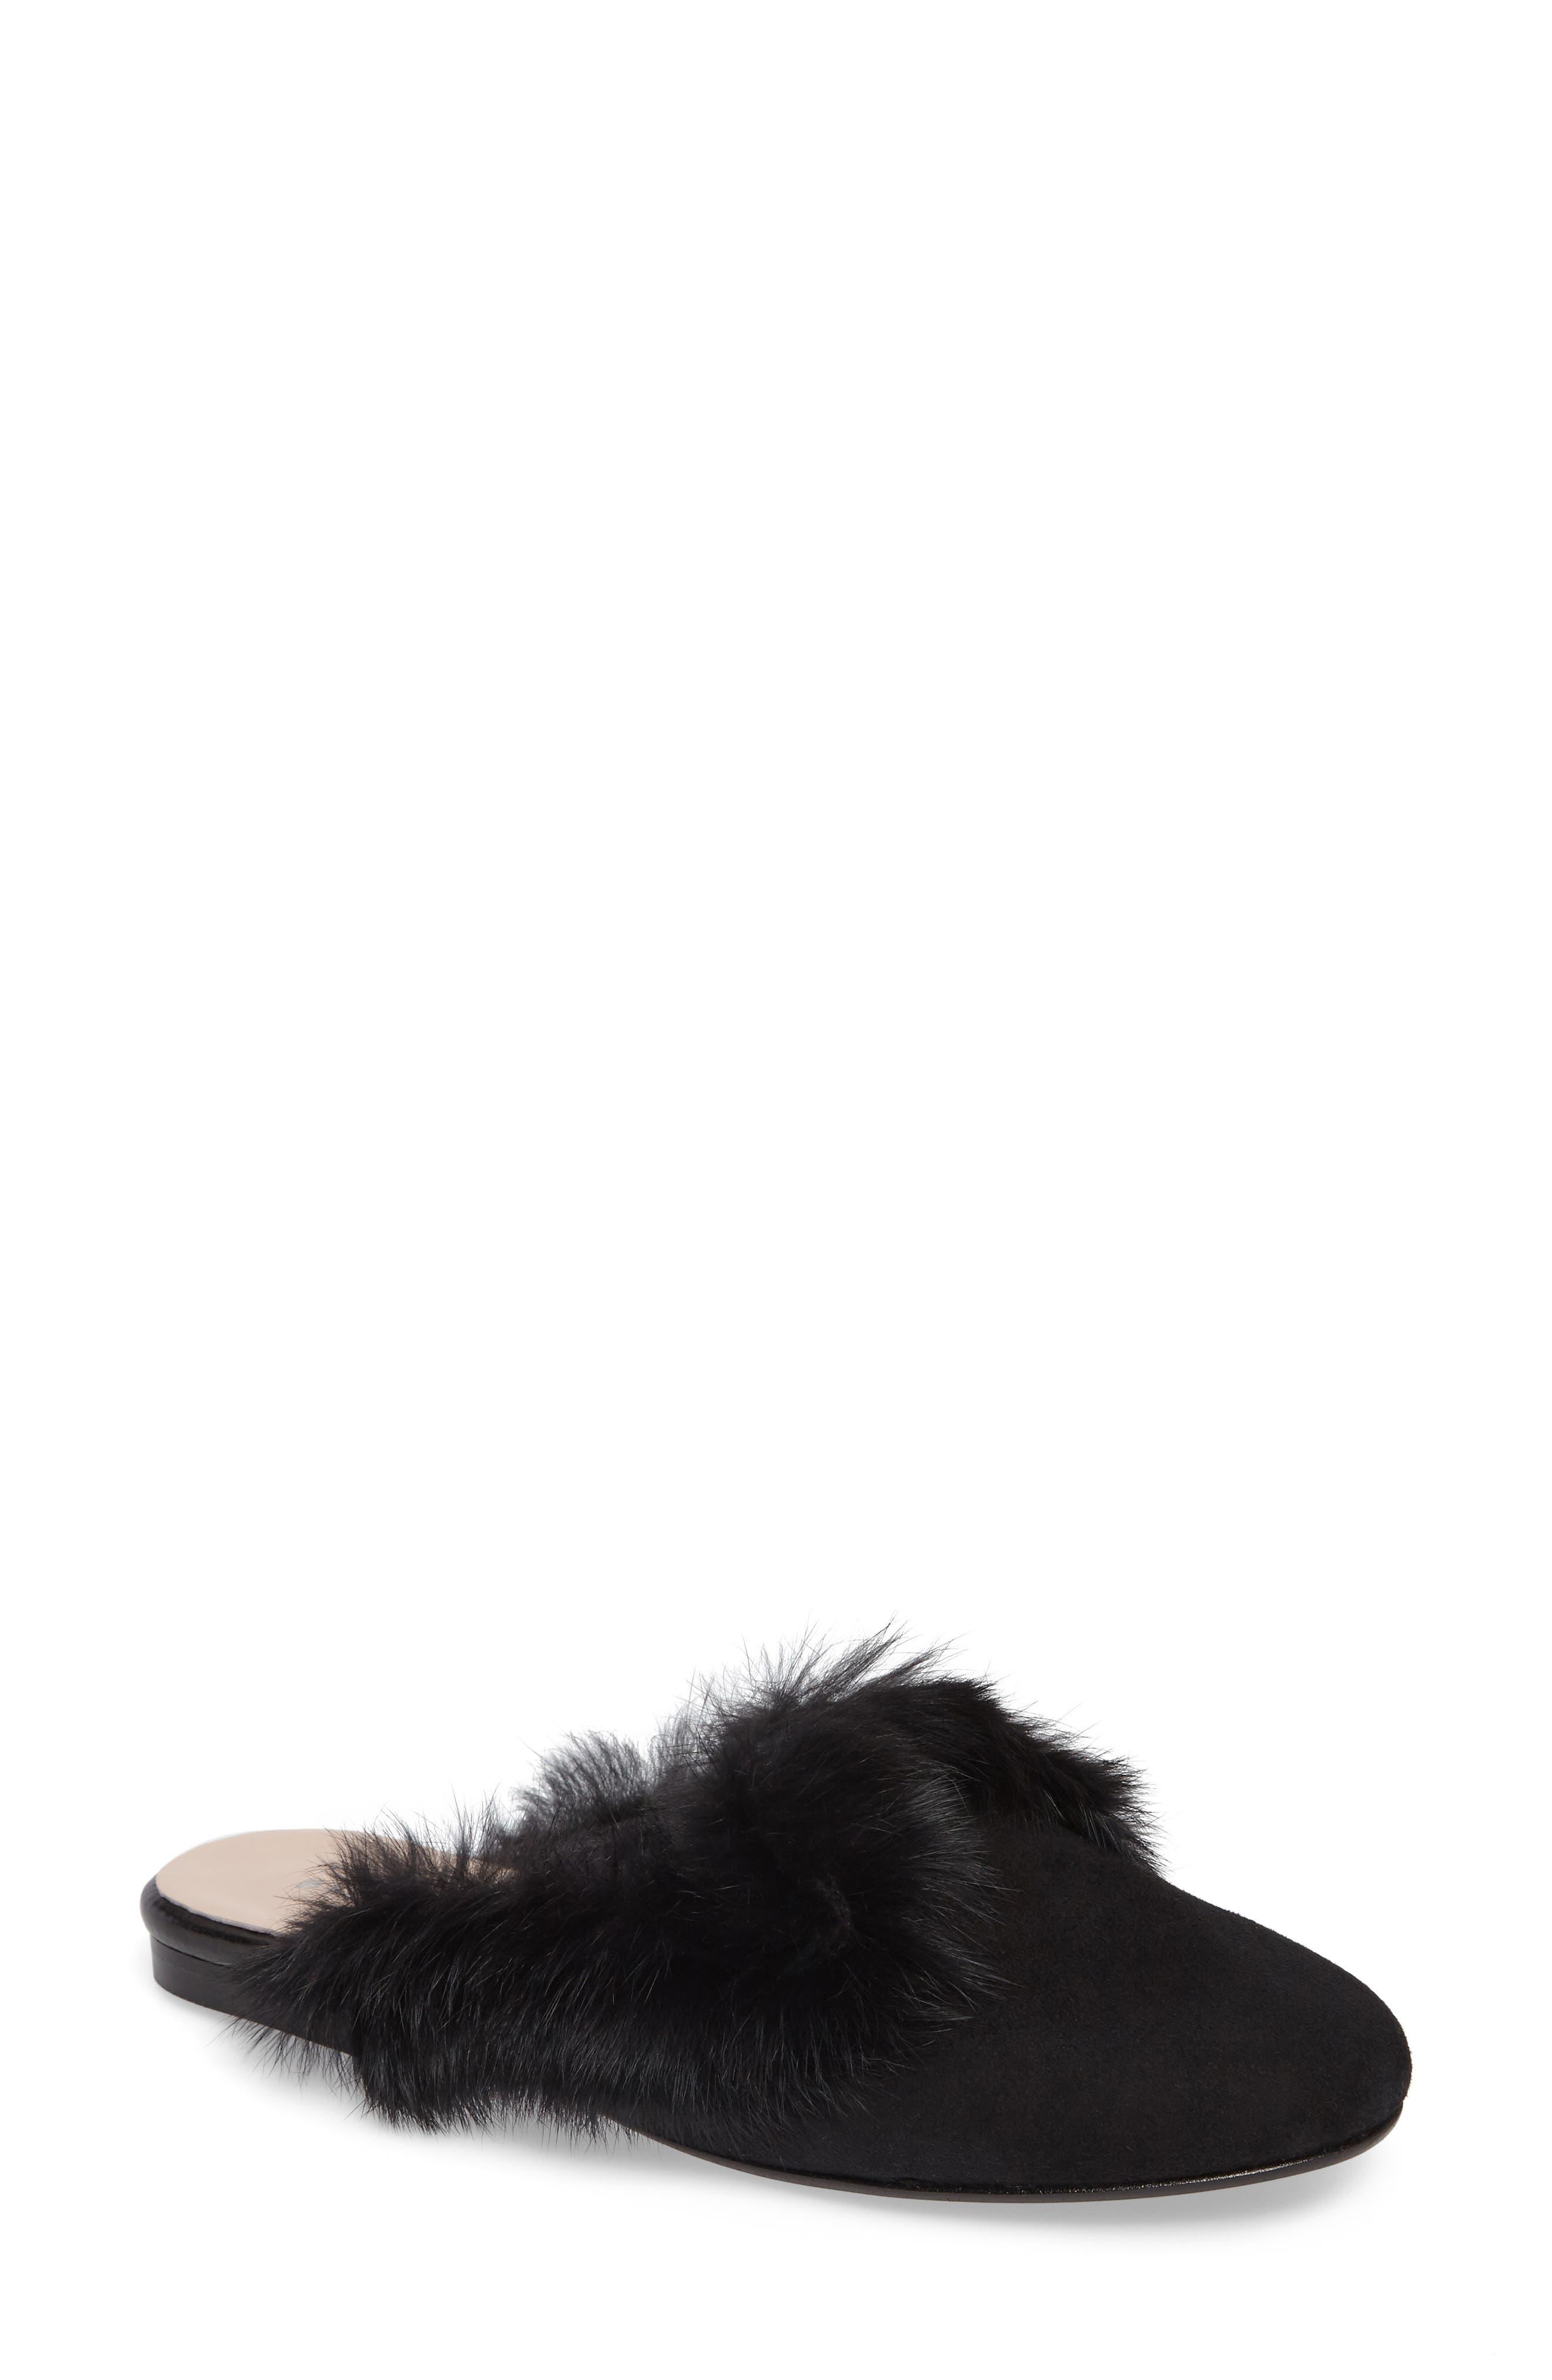 patricia green Stella Genuine Rabbit Fur Loafer Mule (Women)